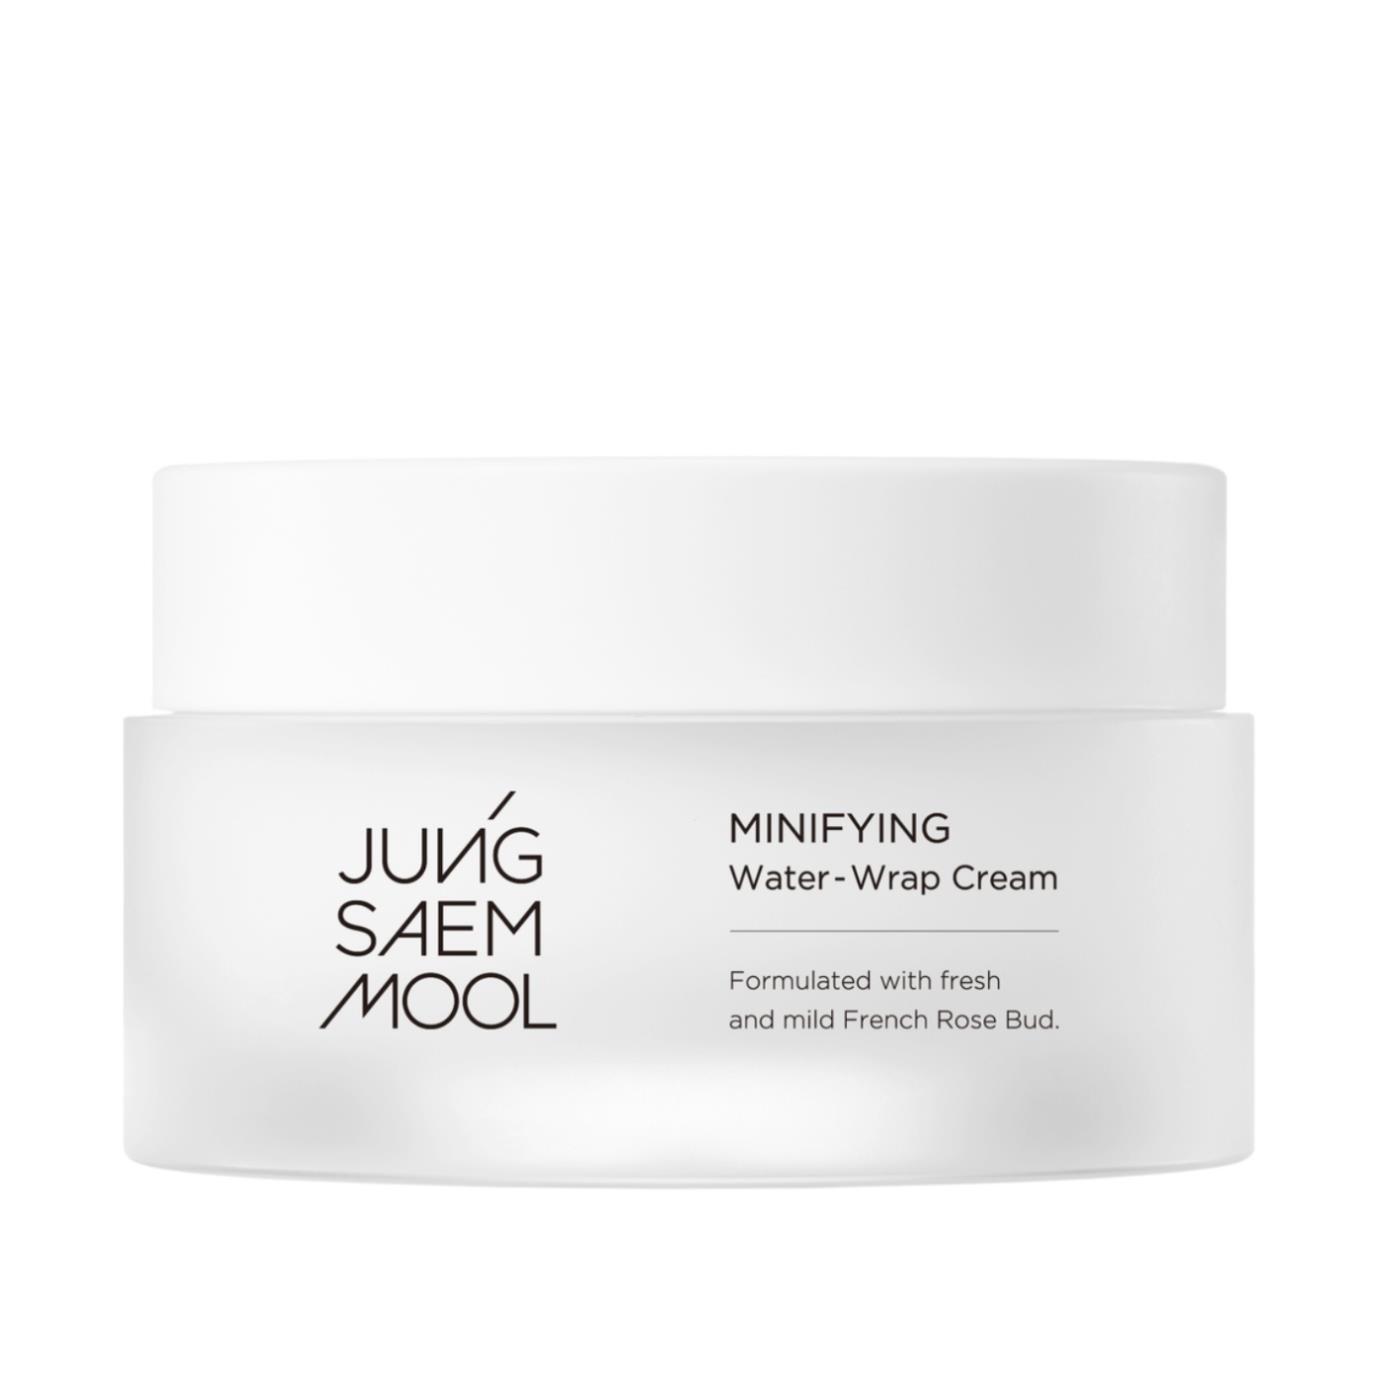 Jung Saem Mool Minifying Water-Wrap Cream